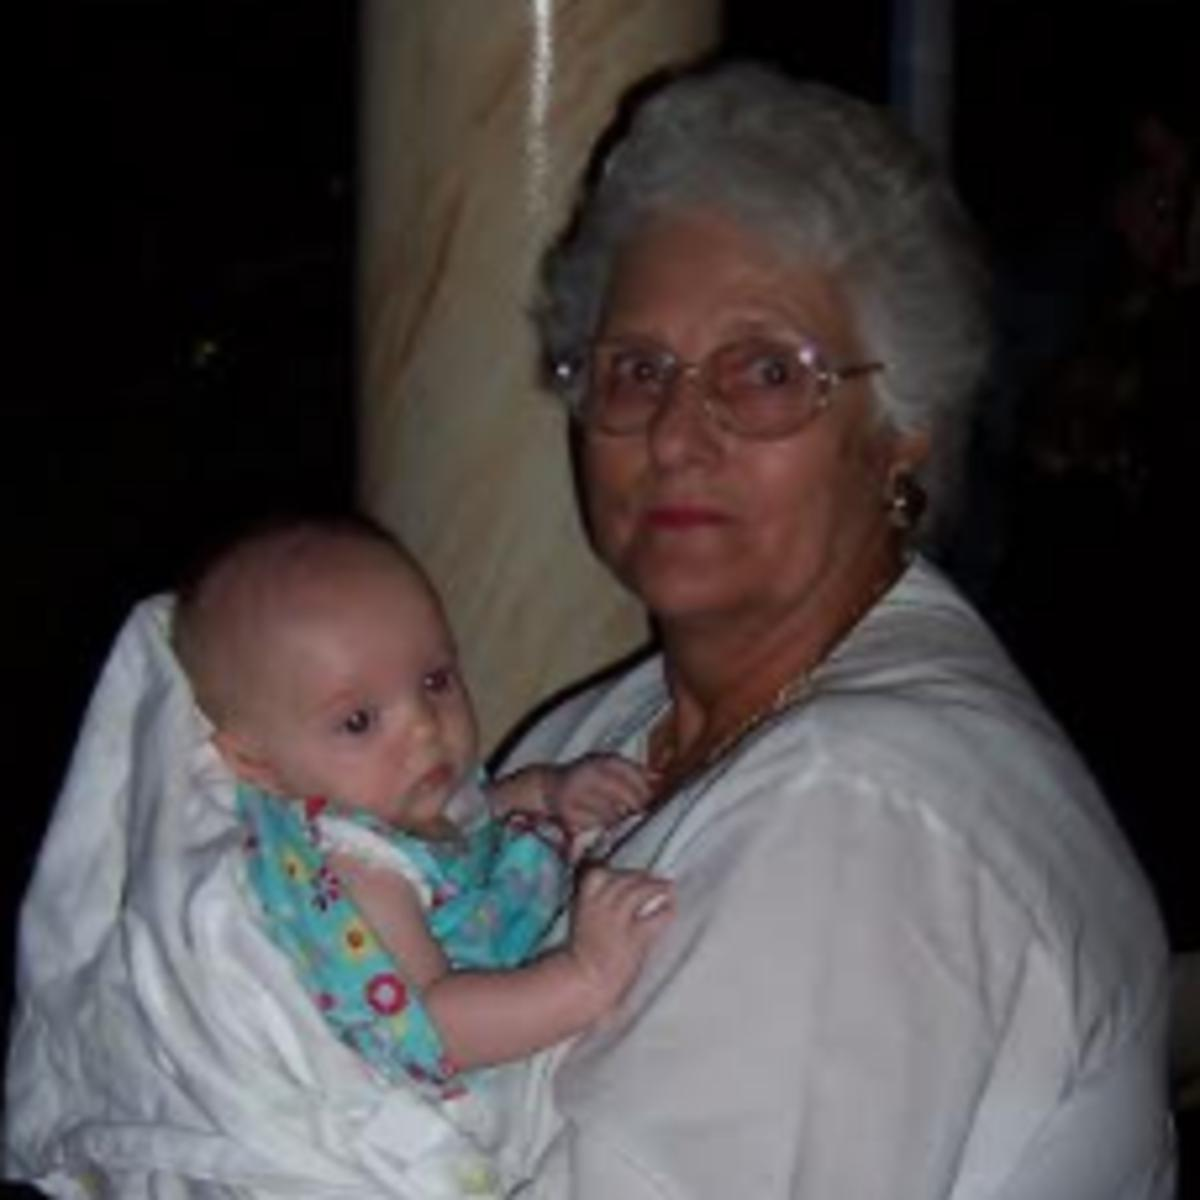 image of grandmother & baby